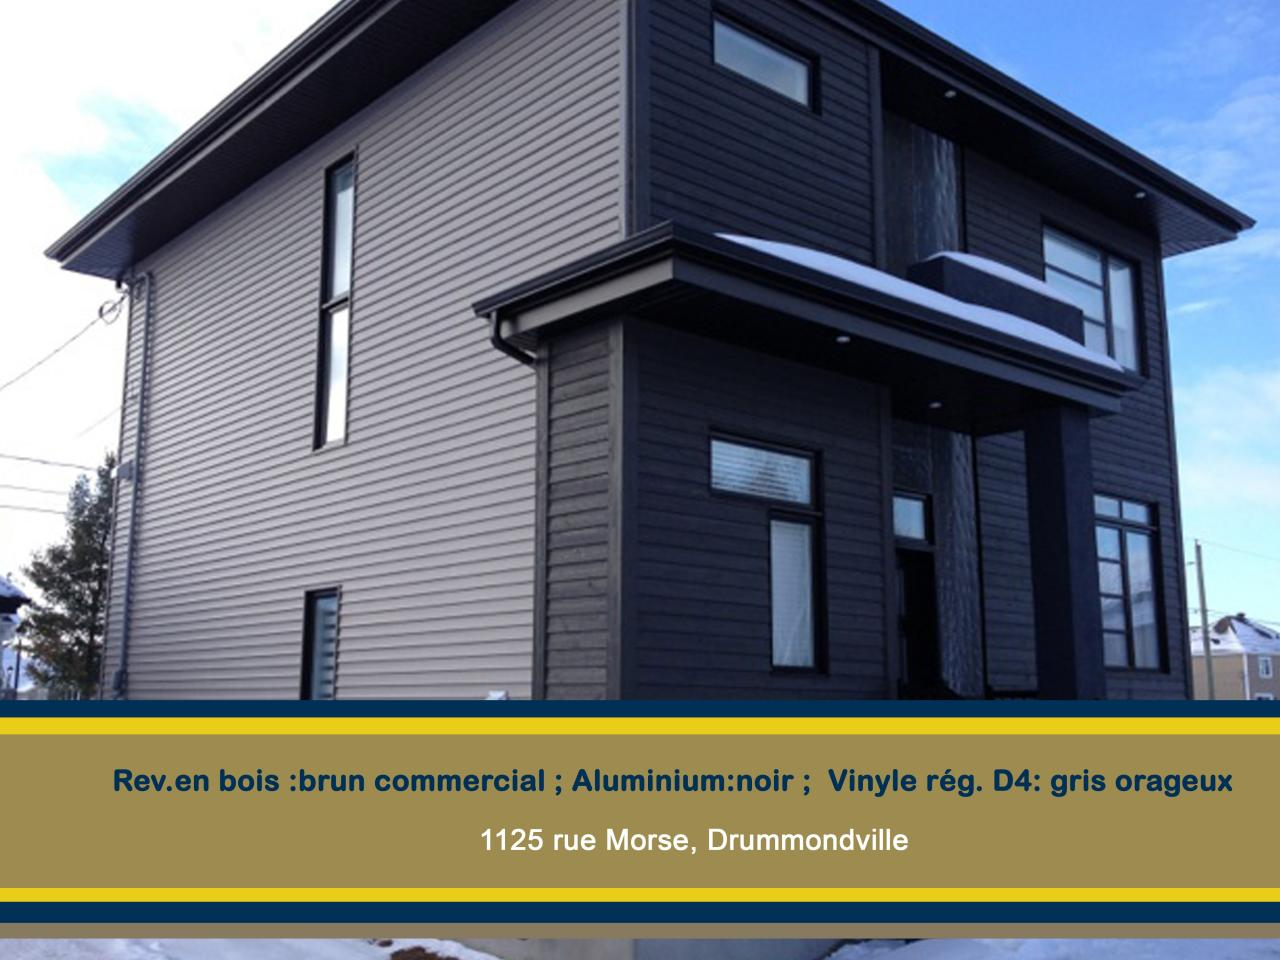 1125 rue Morse Drummondville